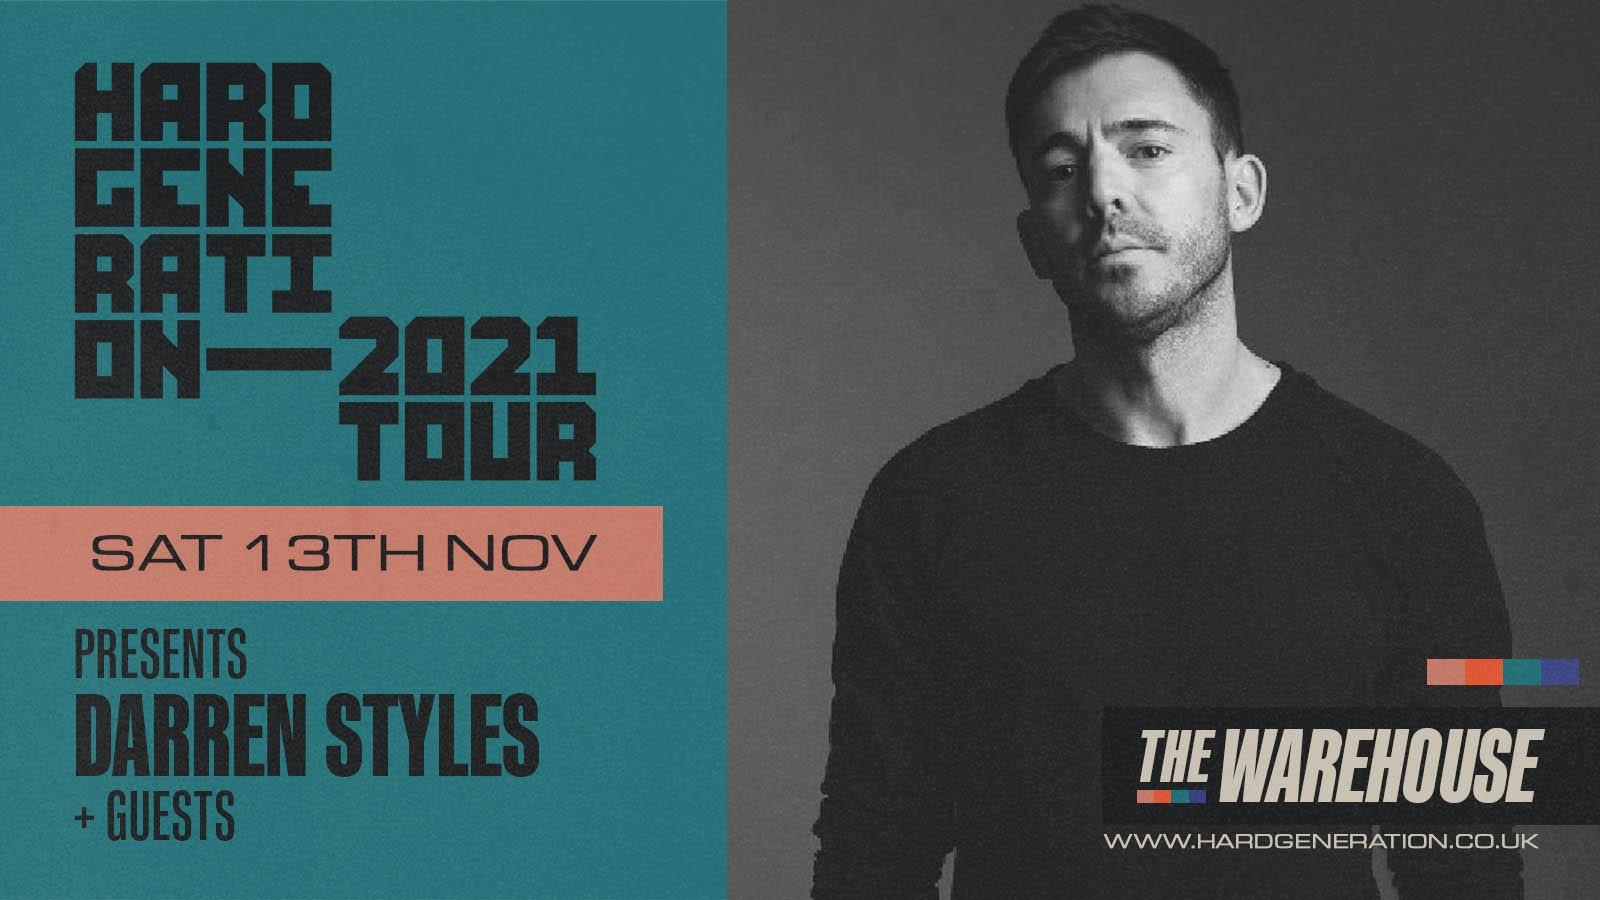 Hard Generation 2021 Tour presents Darren Styles – Club